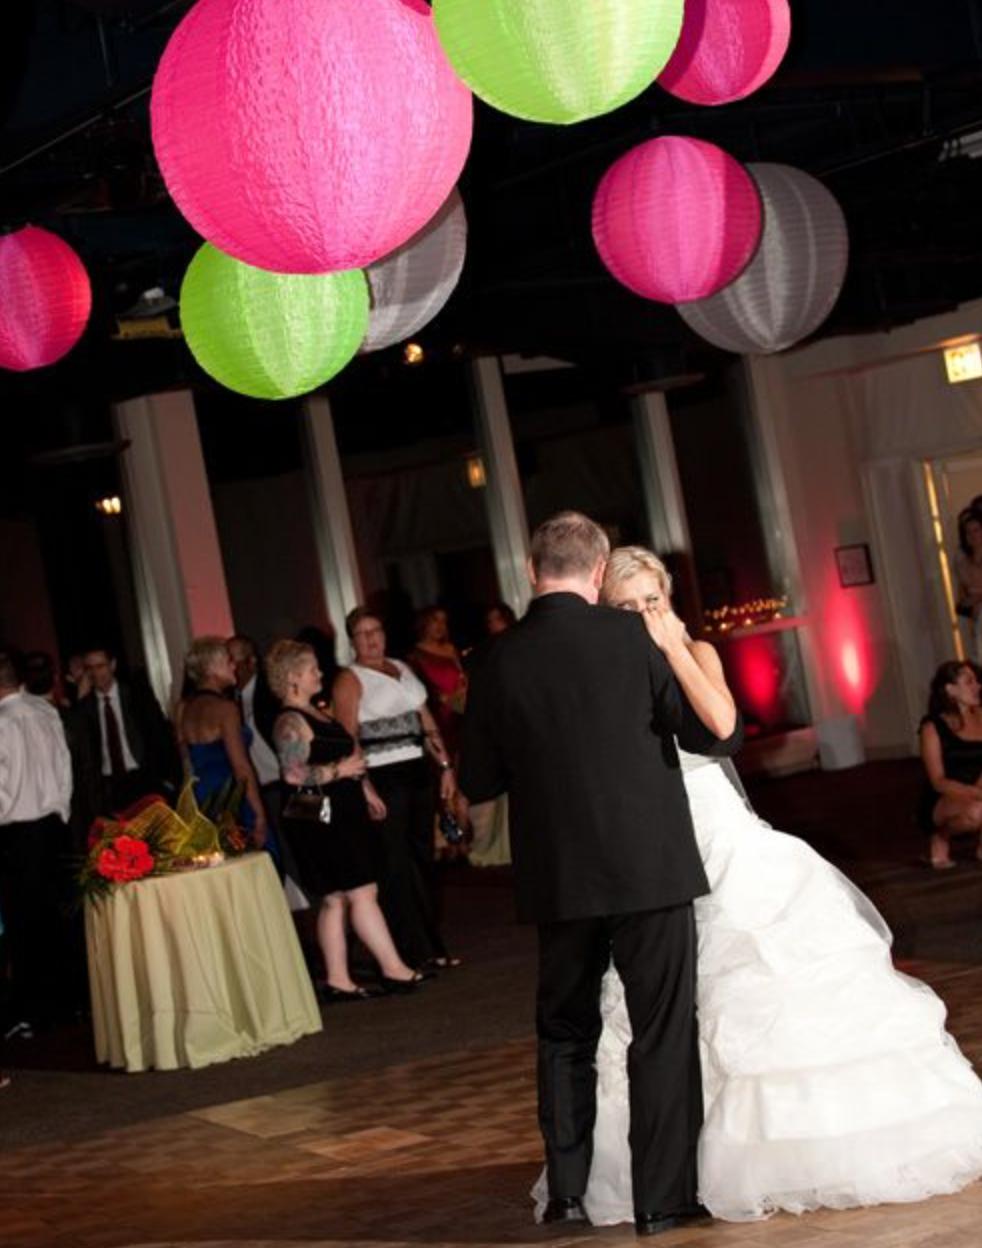 Neon lanterns give an 80's retro vibe to this wedding!